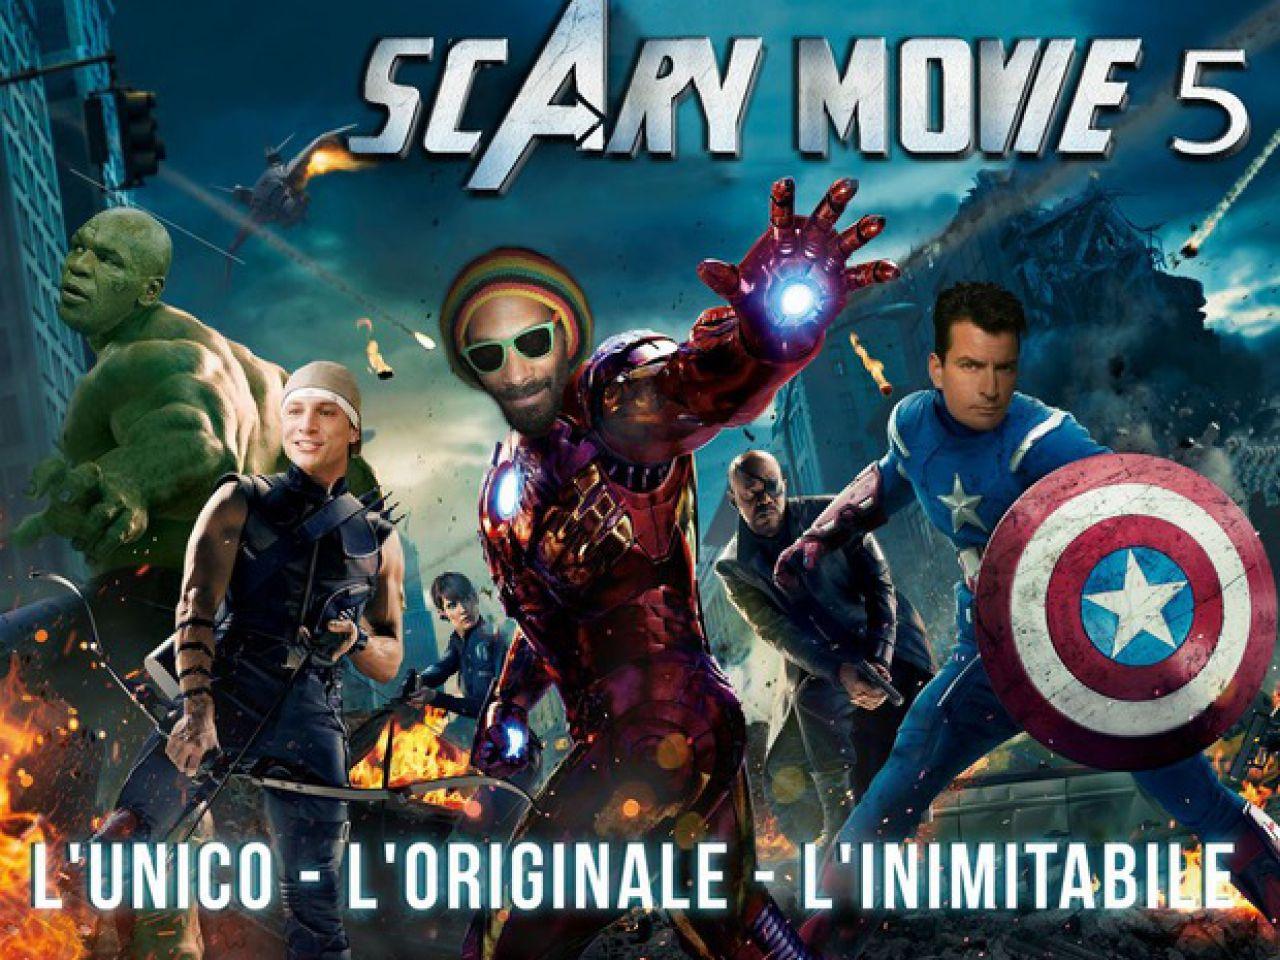 Recensione Scary Movie 5 Everyeye Cinema